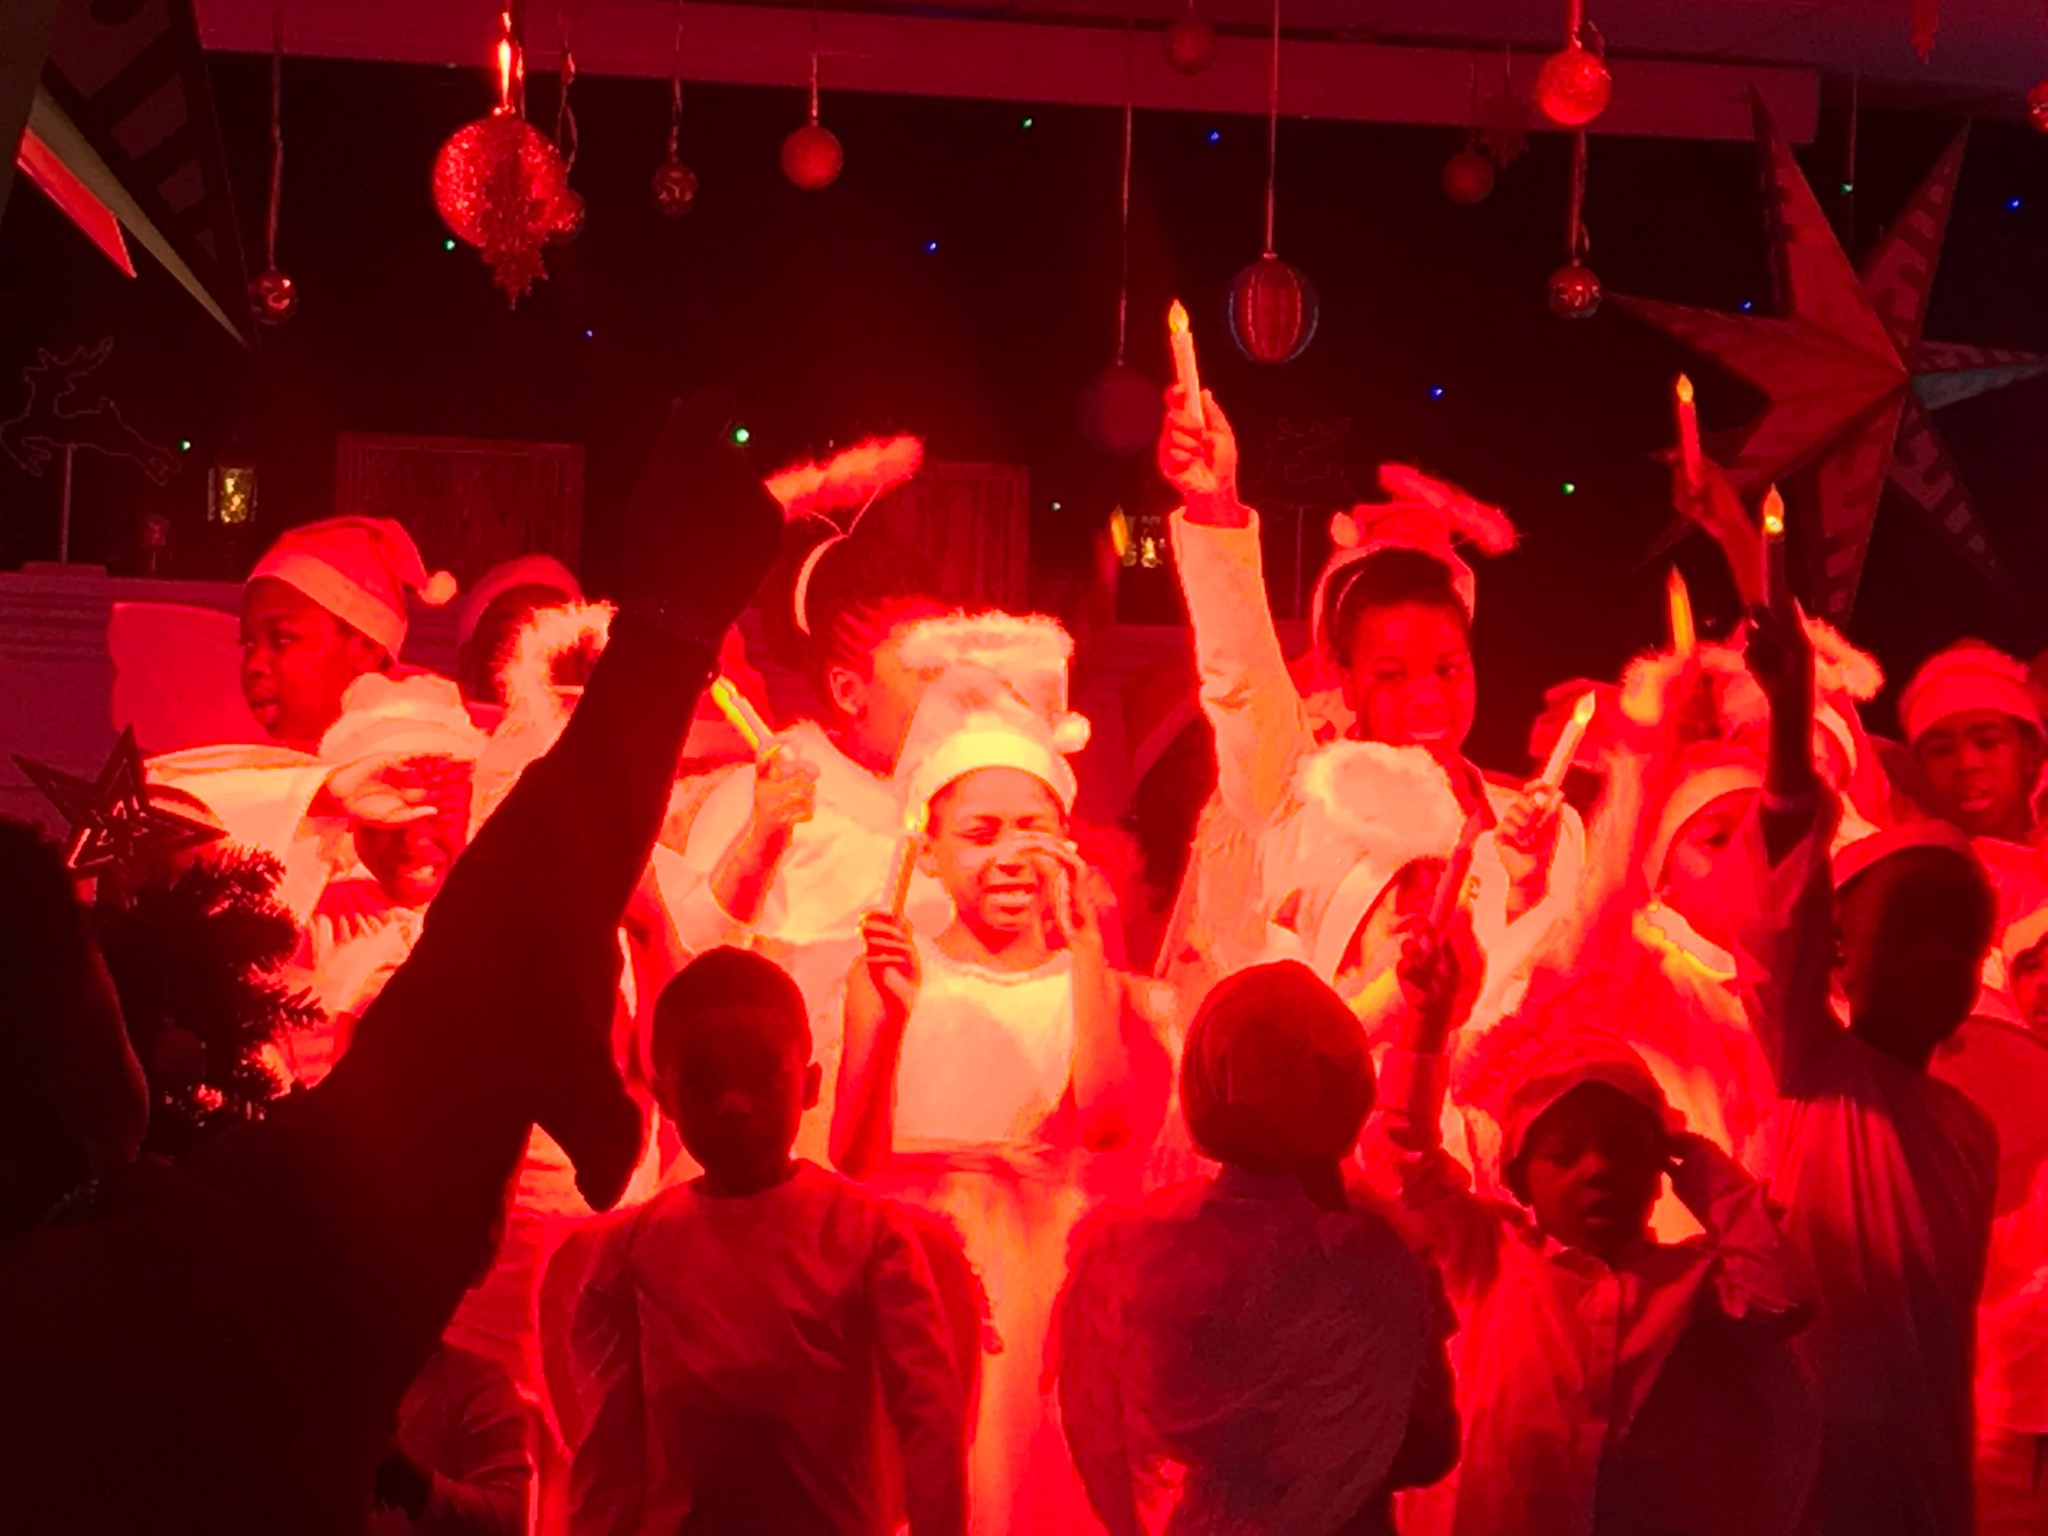 #LWThamesmead #ChristmasCarol